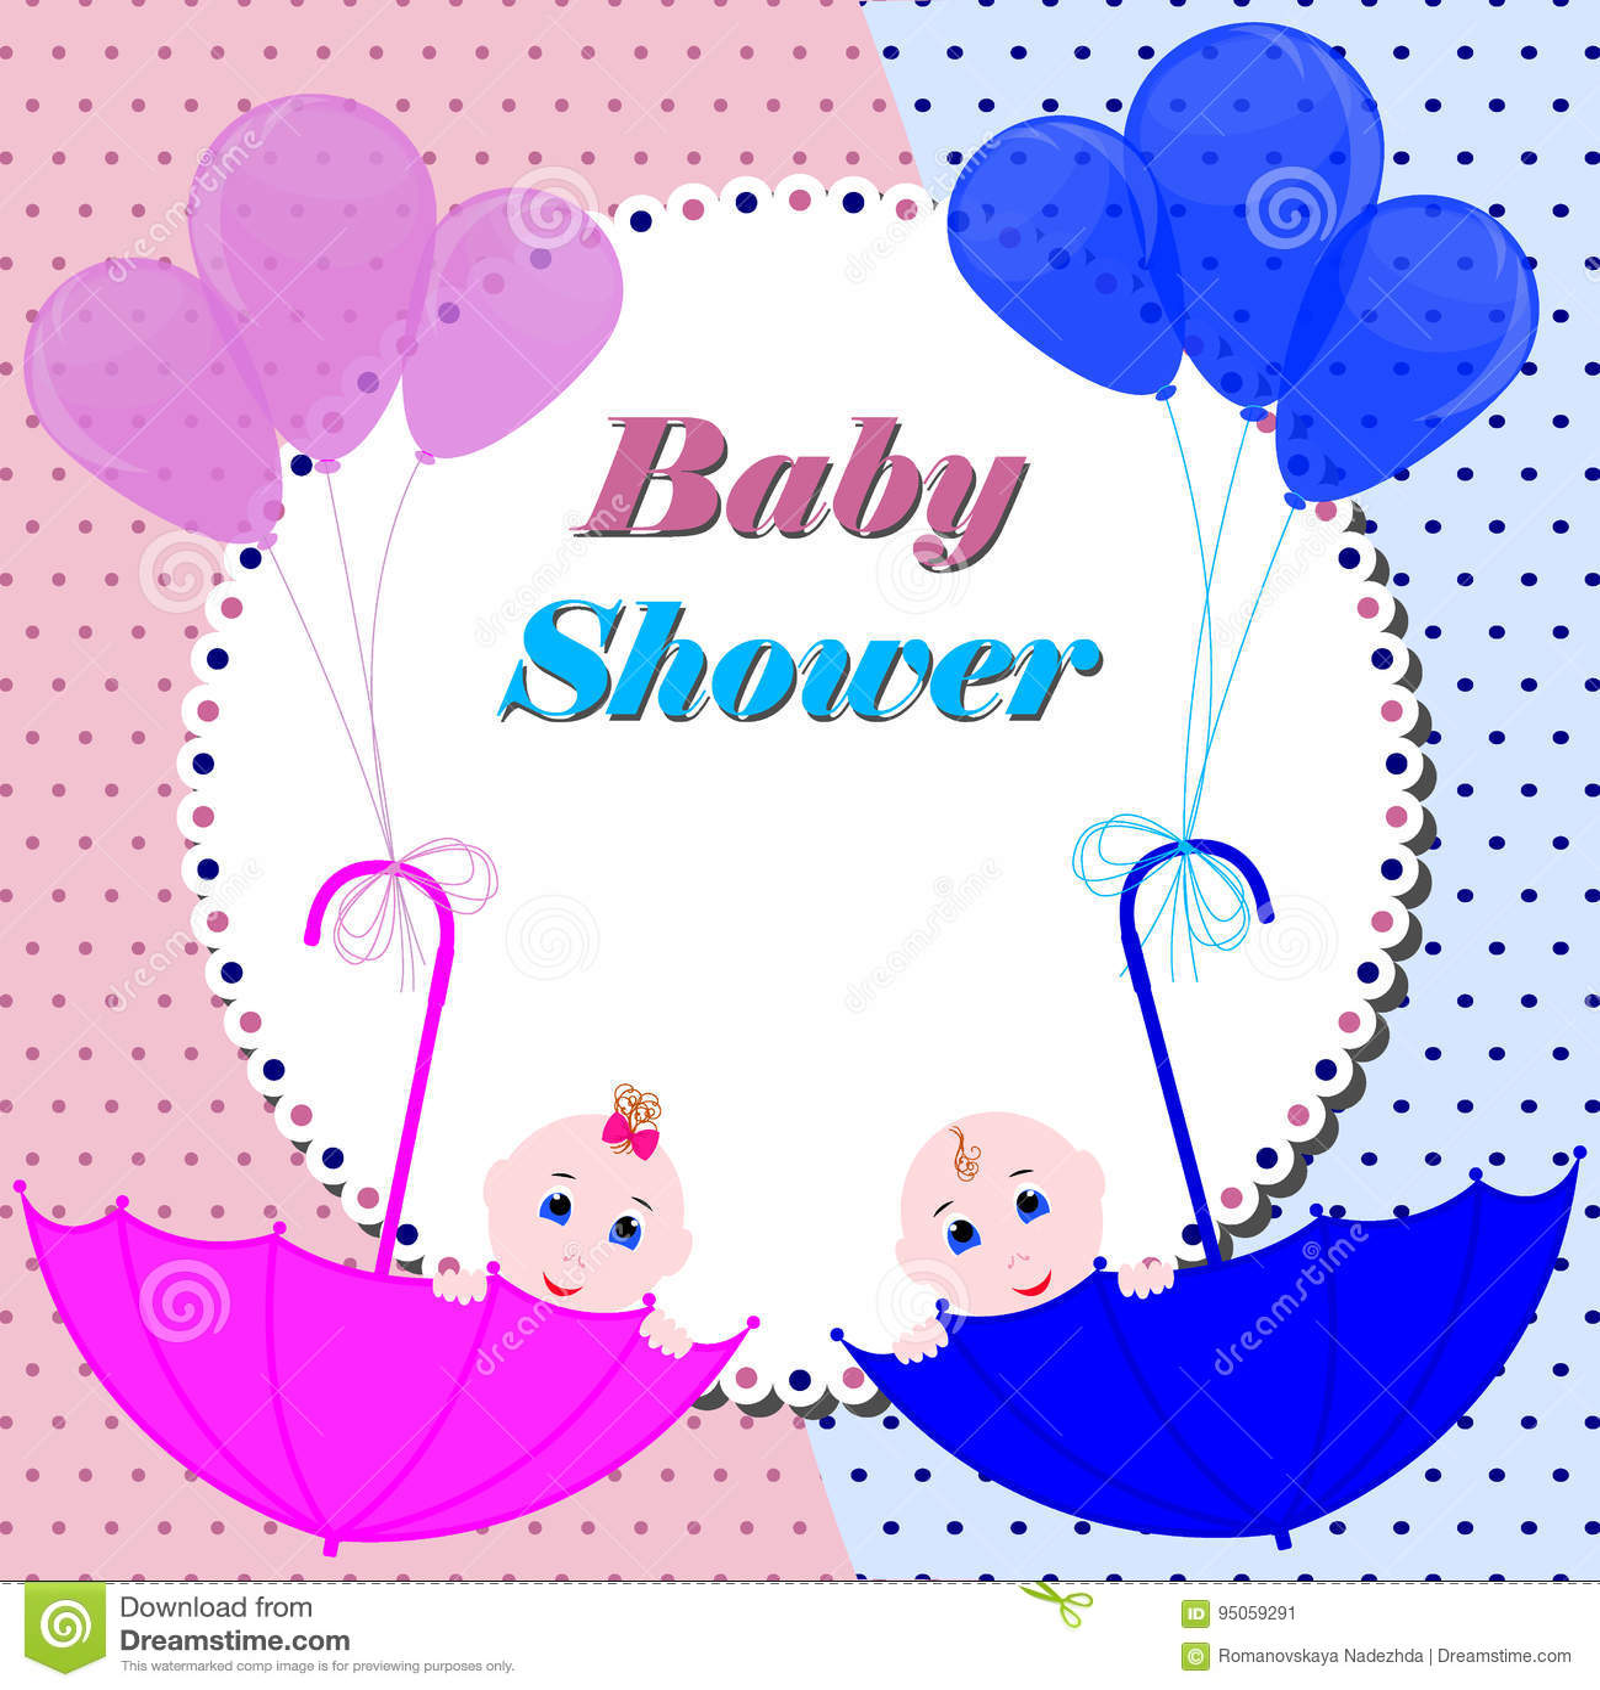 baby shower invitation card cute boy and girl stock illustration illustration of celebration greeting 95059291